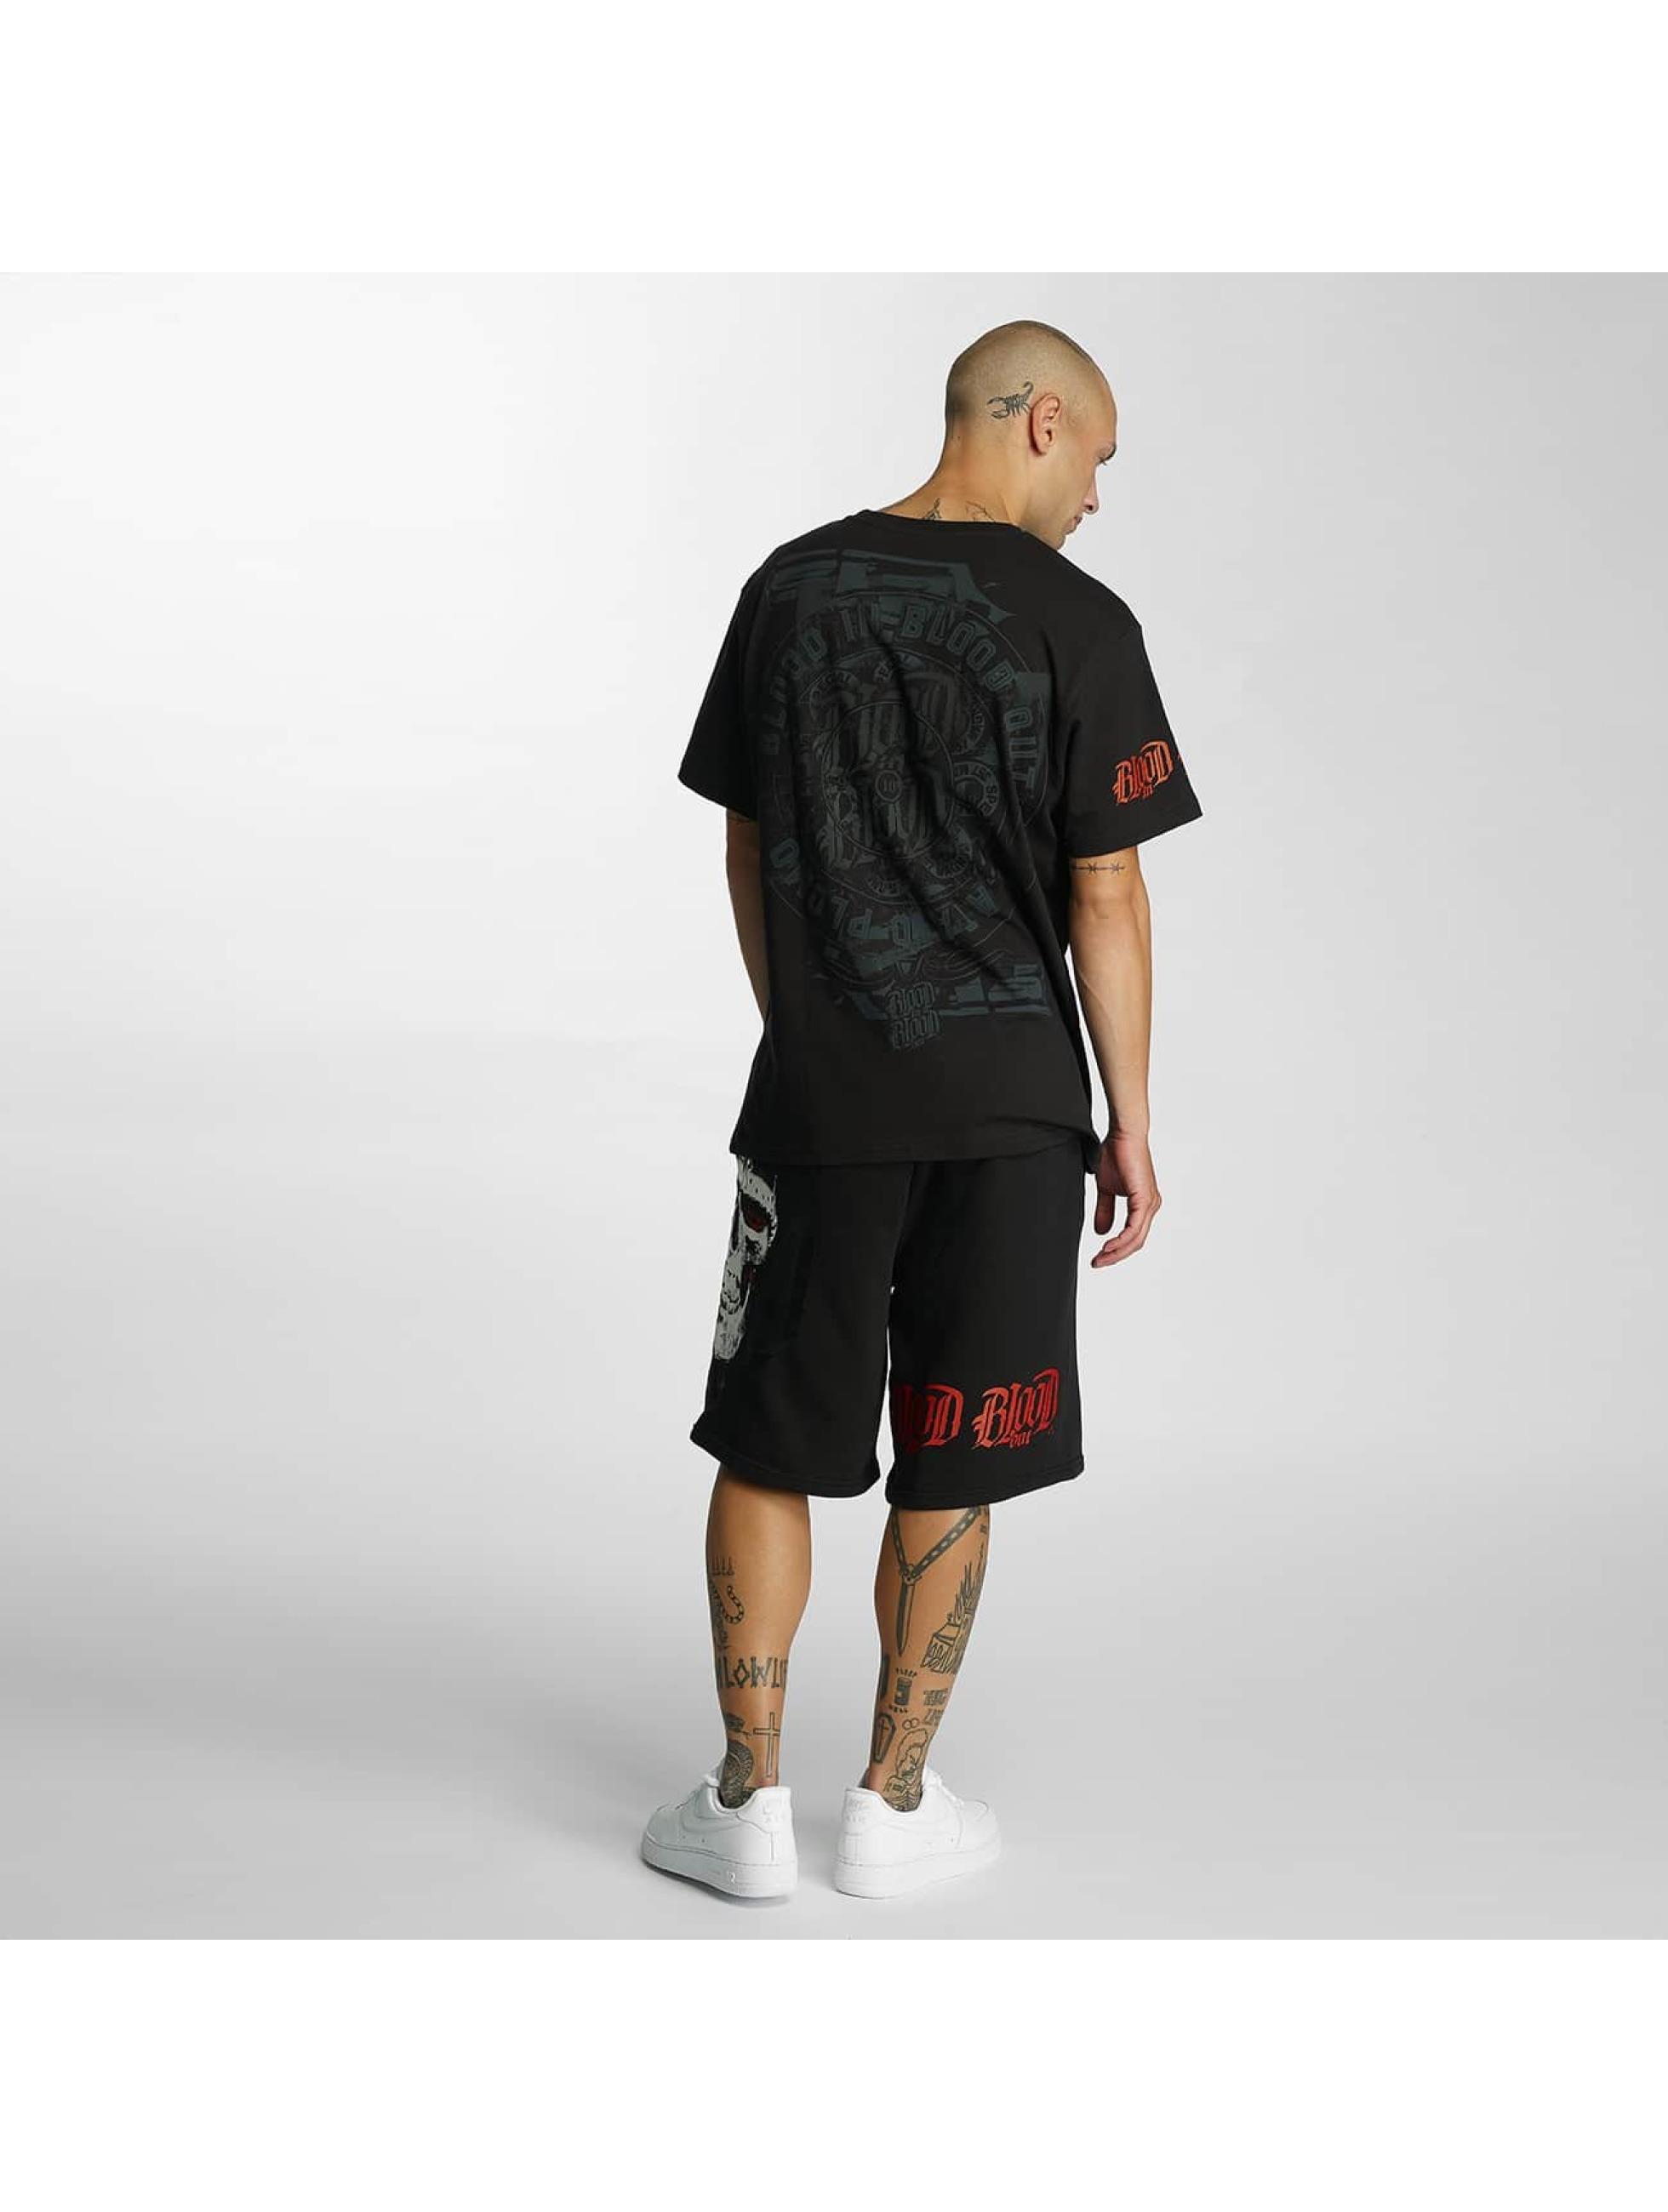 Blood In Blood Out t-shirt Plata O Plomo zwart